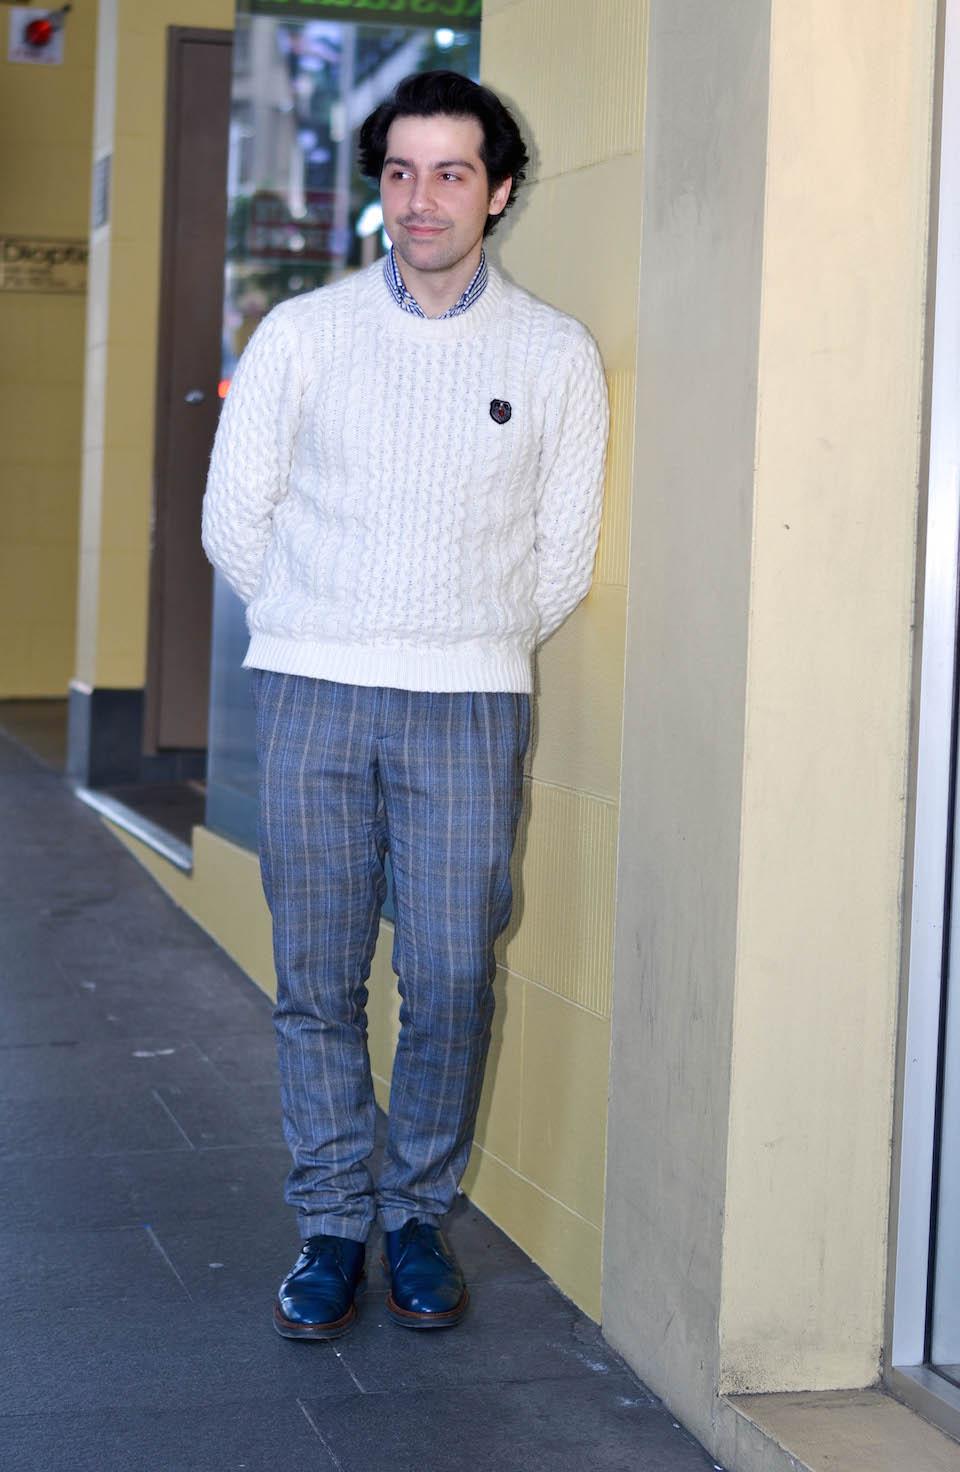 NSW: Alexander Yaghldjian, spotted in Sydney by Alice Scriberras.